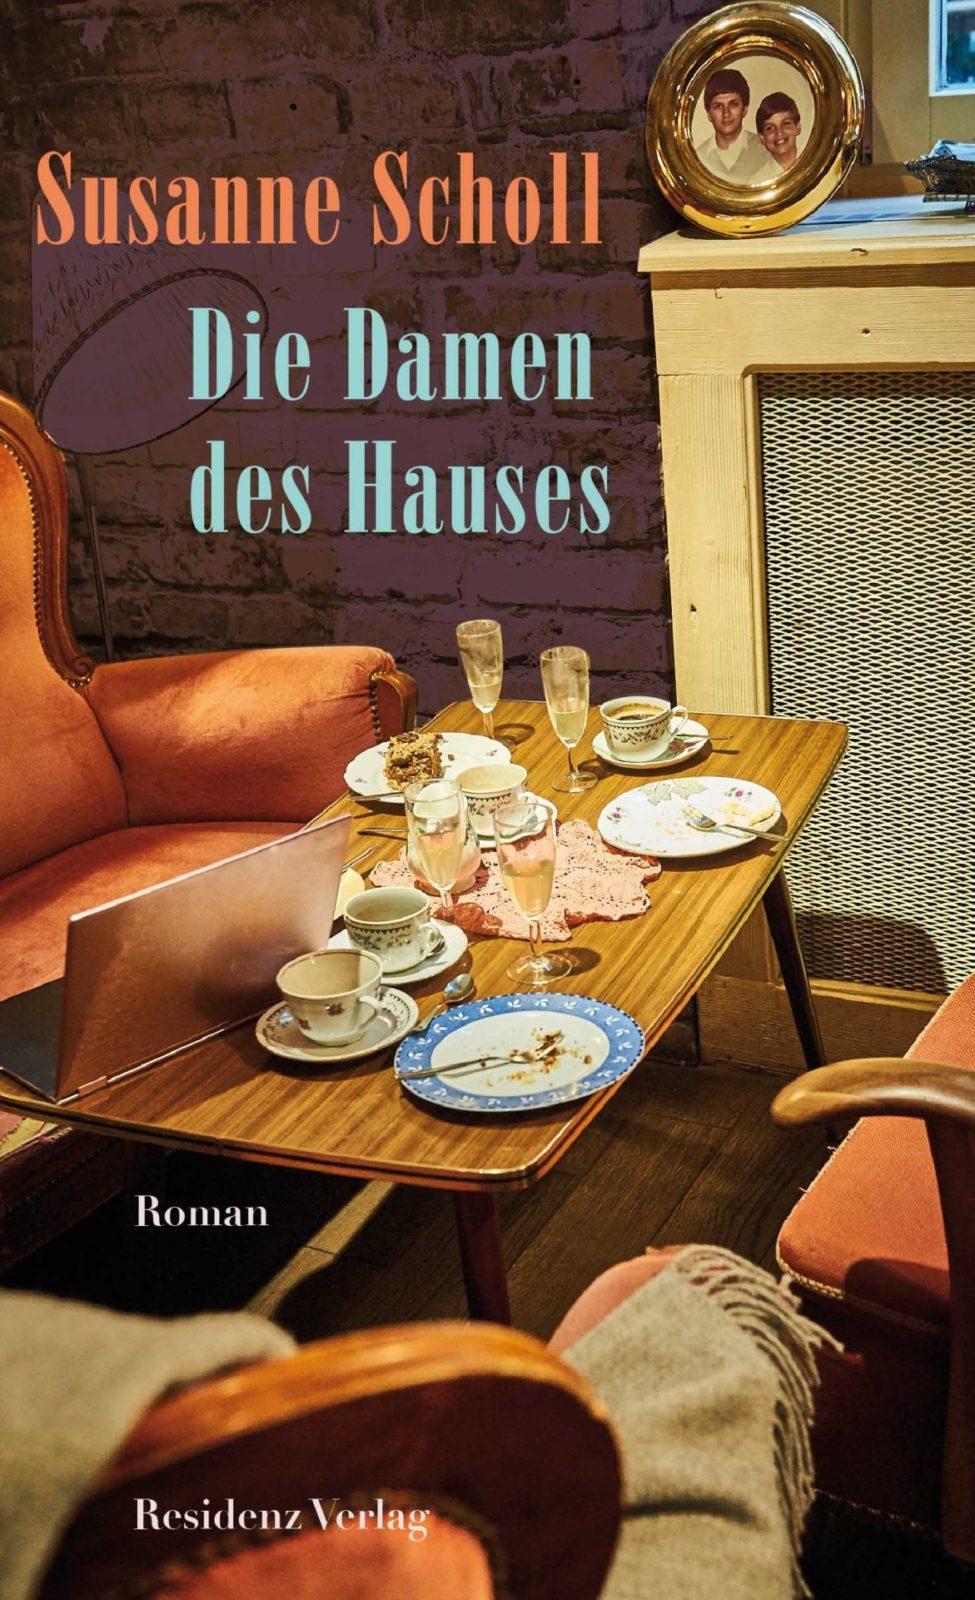 Madamewien.at, Susanne Scholl, Roman, Residenz Verlag, leselust